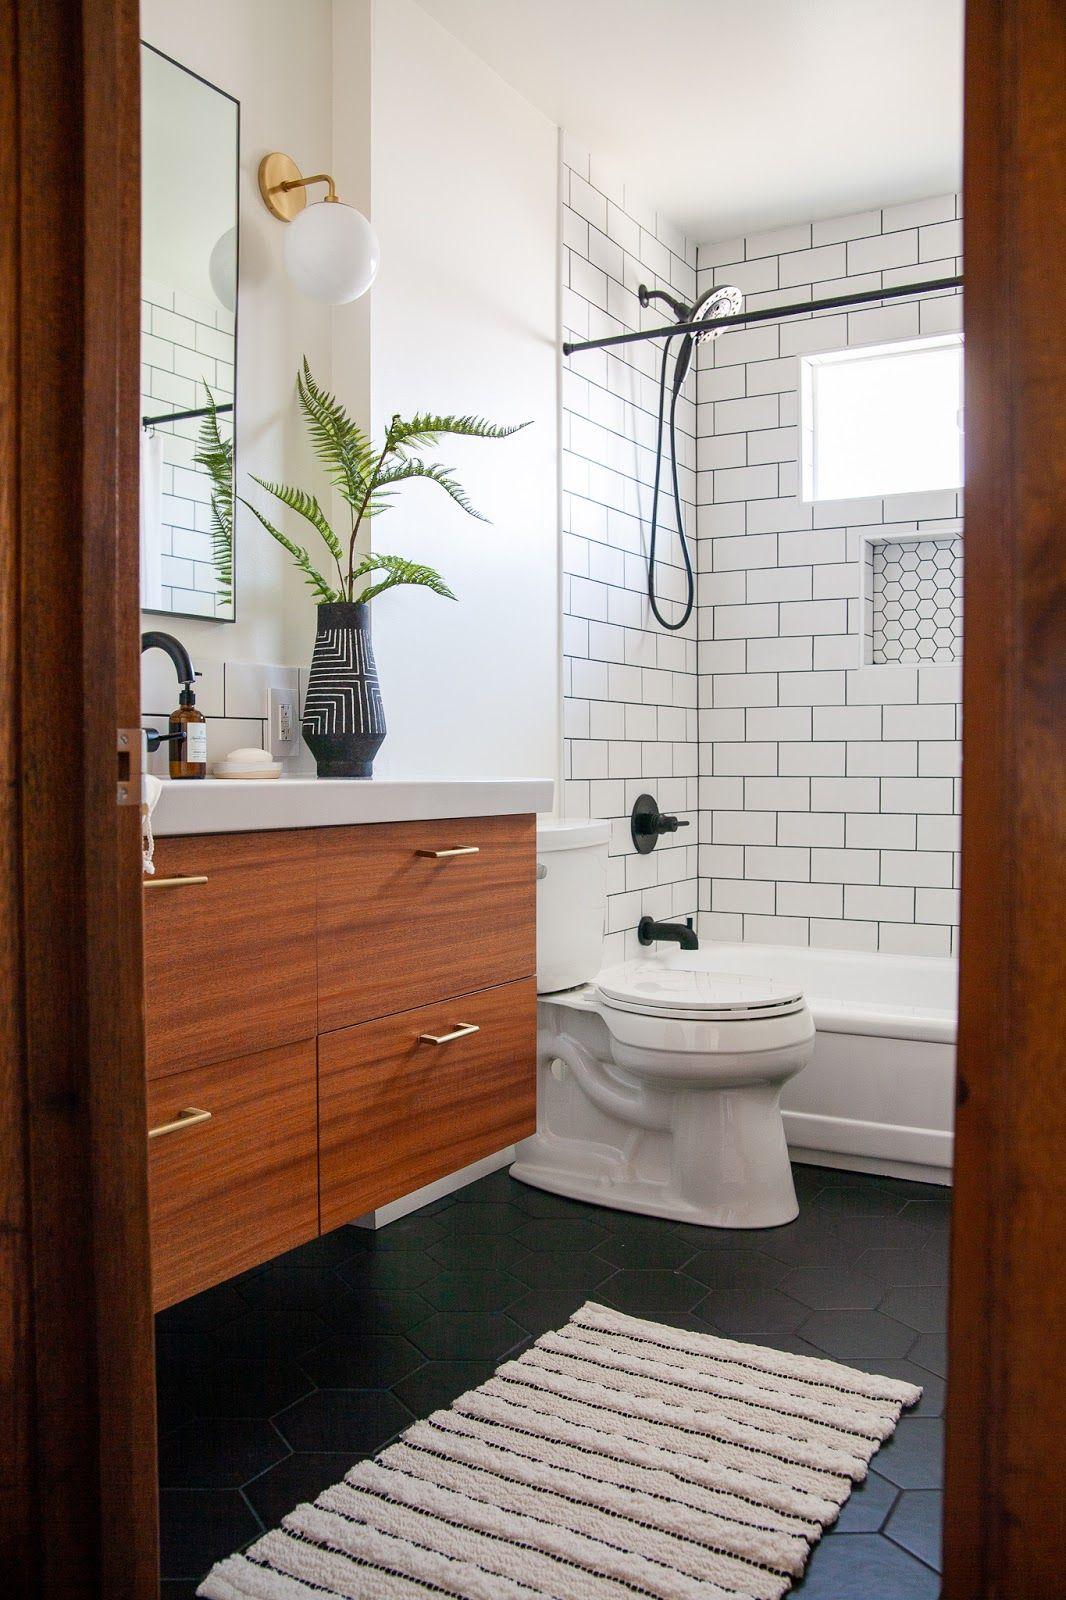 modern bathroom renovation reveal the finished one room on bathroom renovation ideas modern id=61477